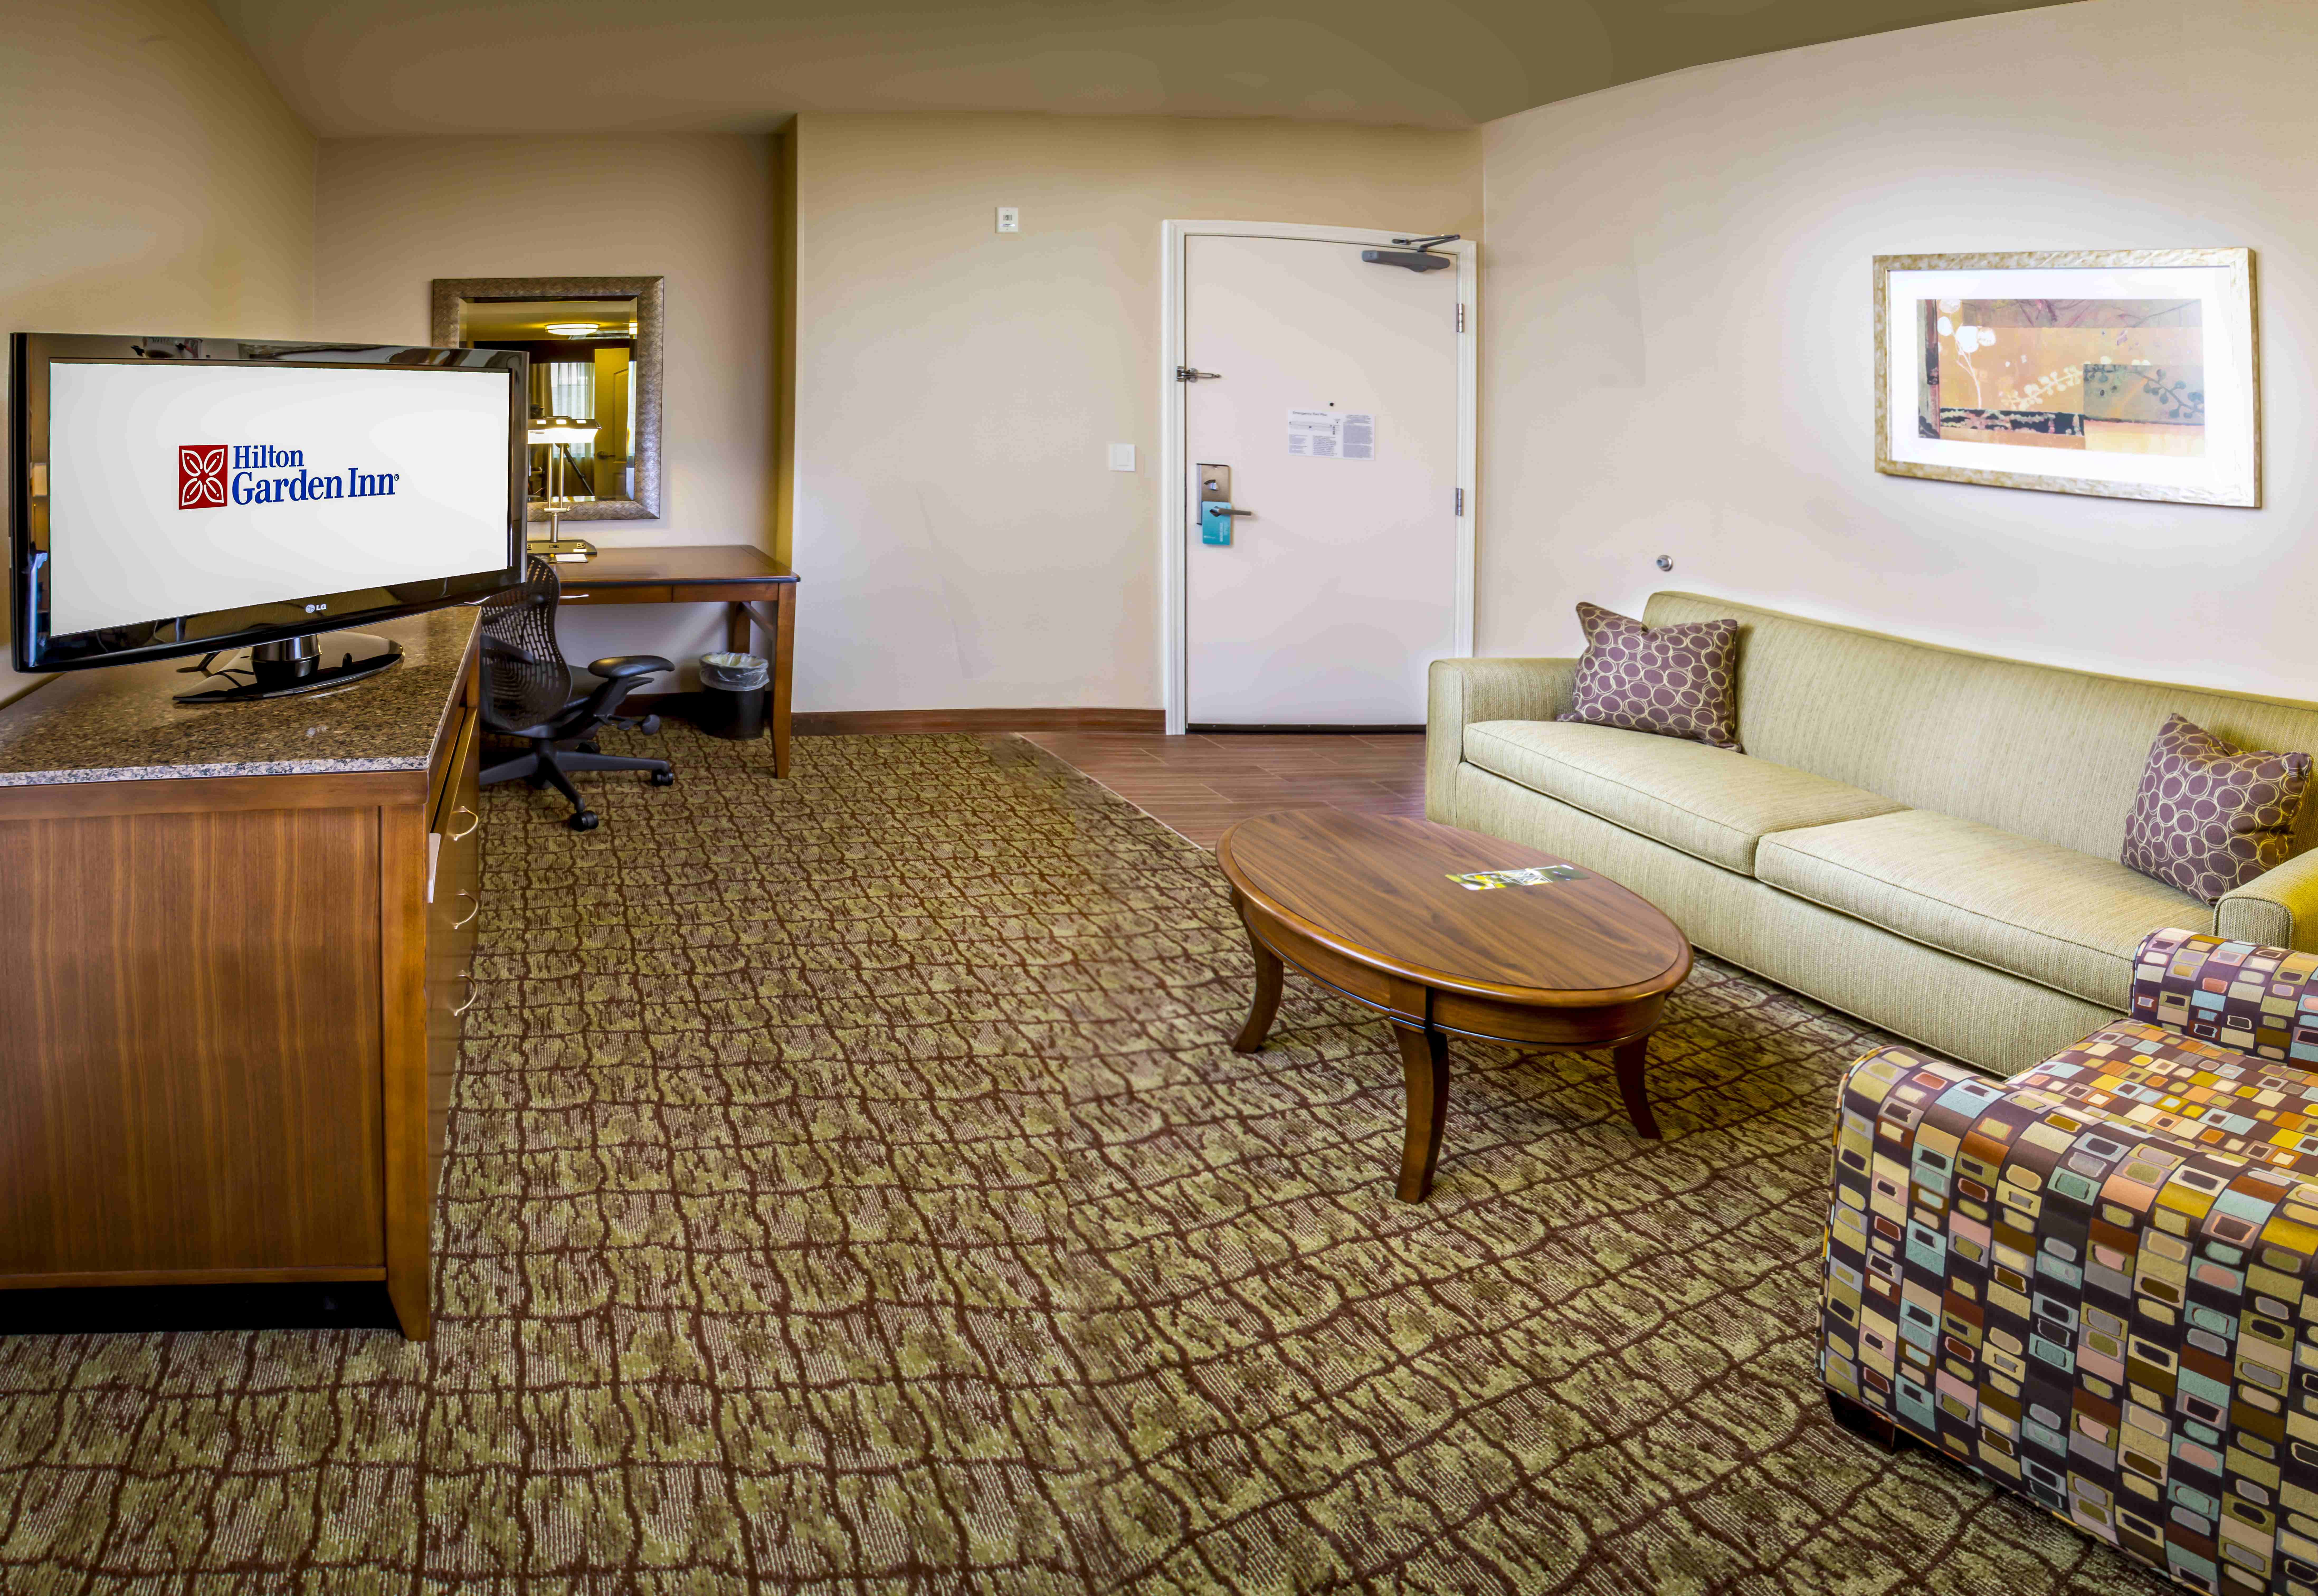 Hilton Garden Inn Boise Spectrum In Boise Id 83709